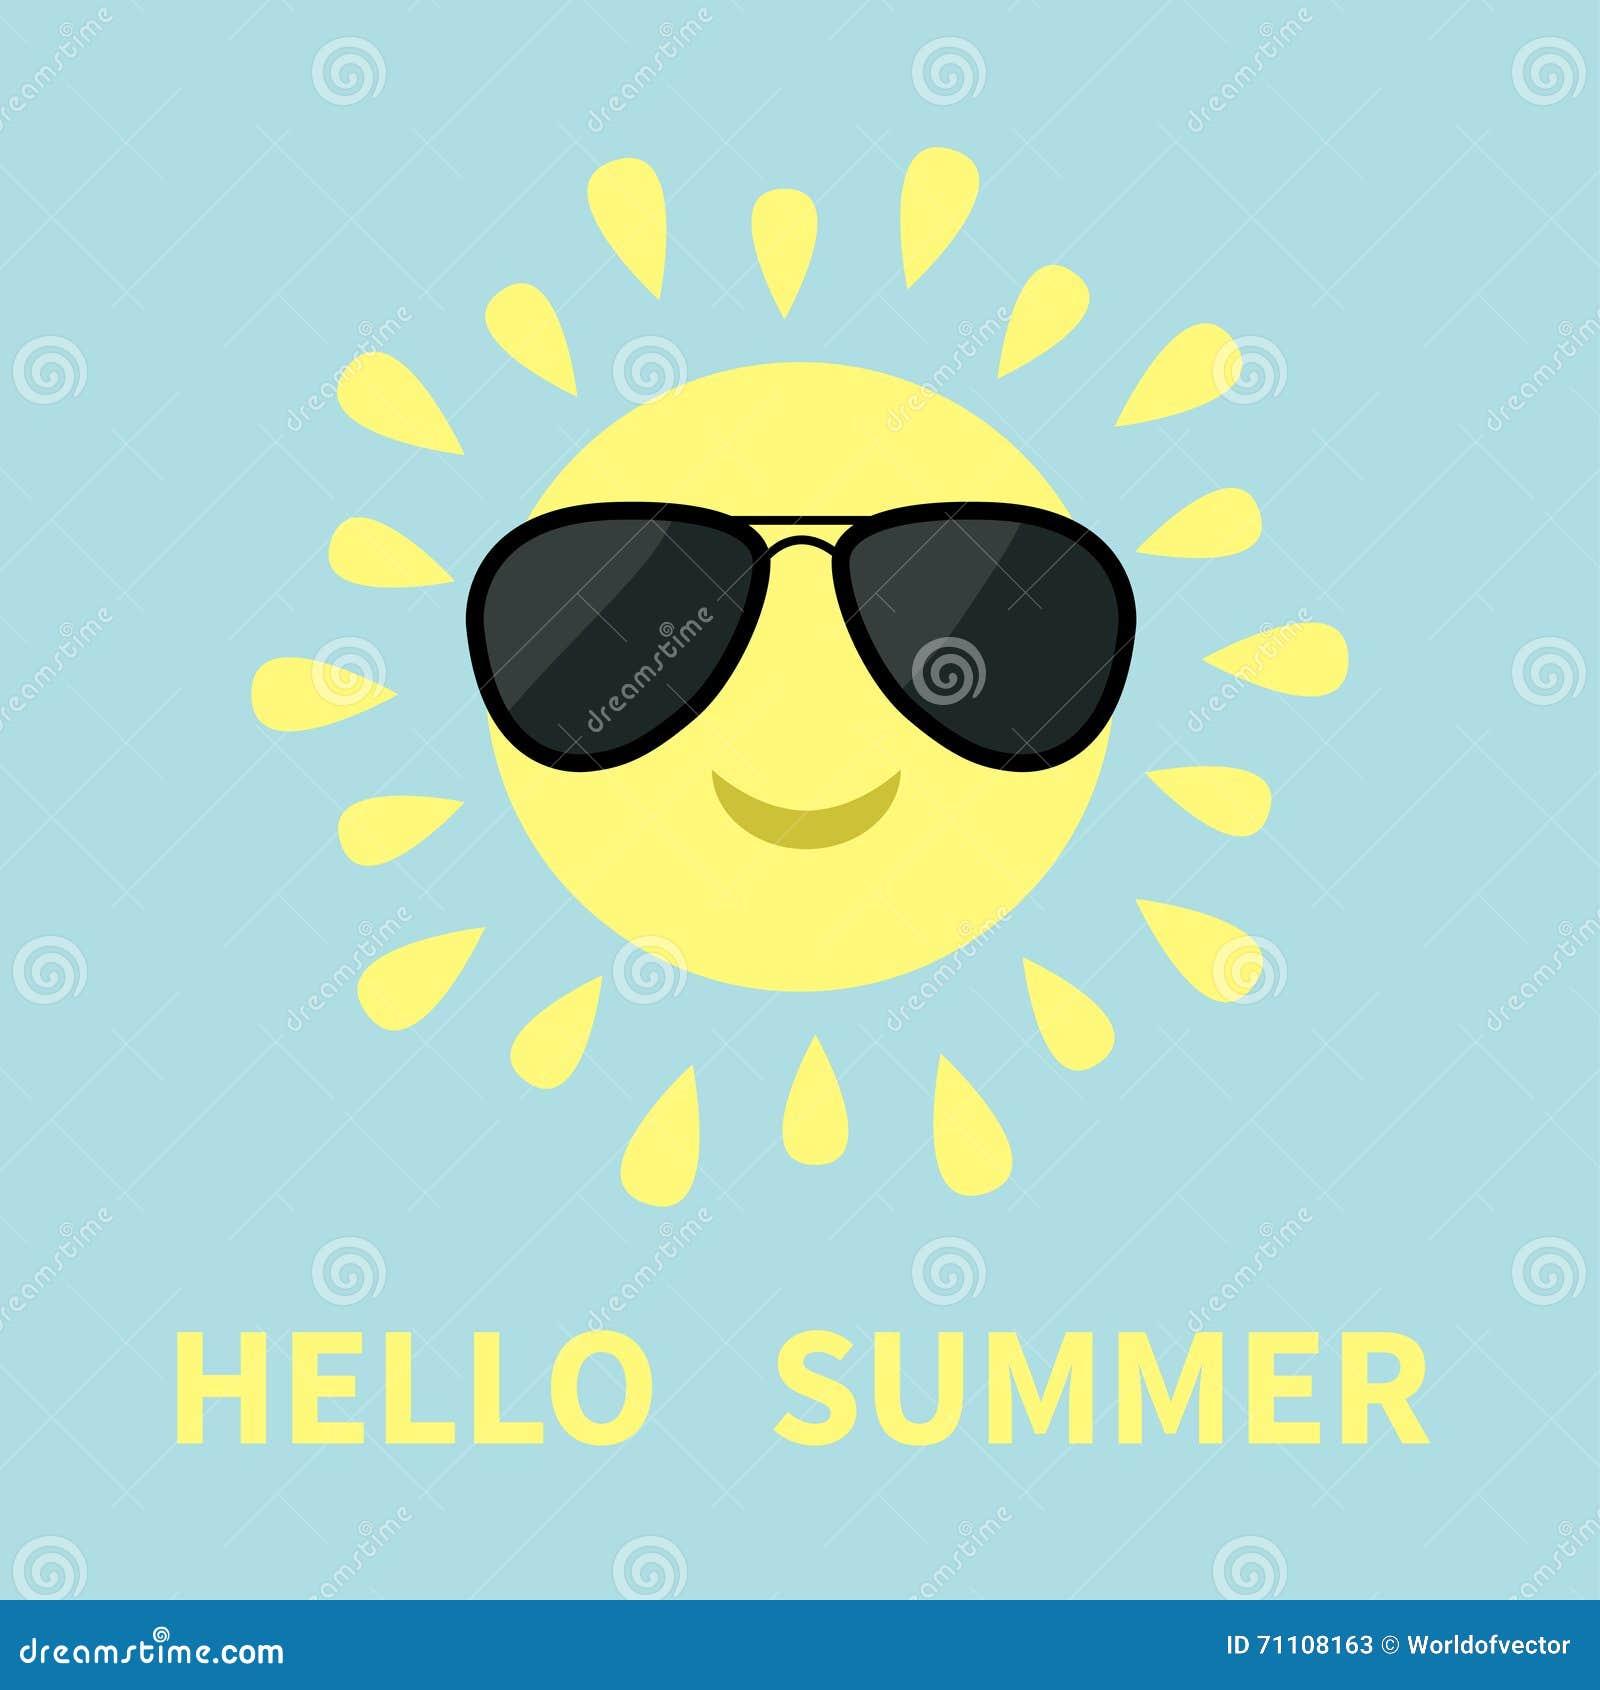 Sun Shining Icon. Sun Face With Sunglassess. Cute Cartoon Funny Smiling Chara...